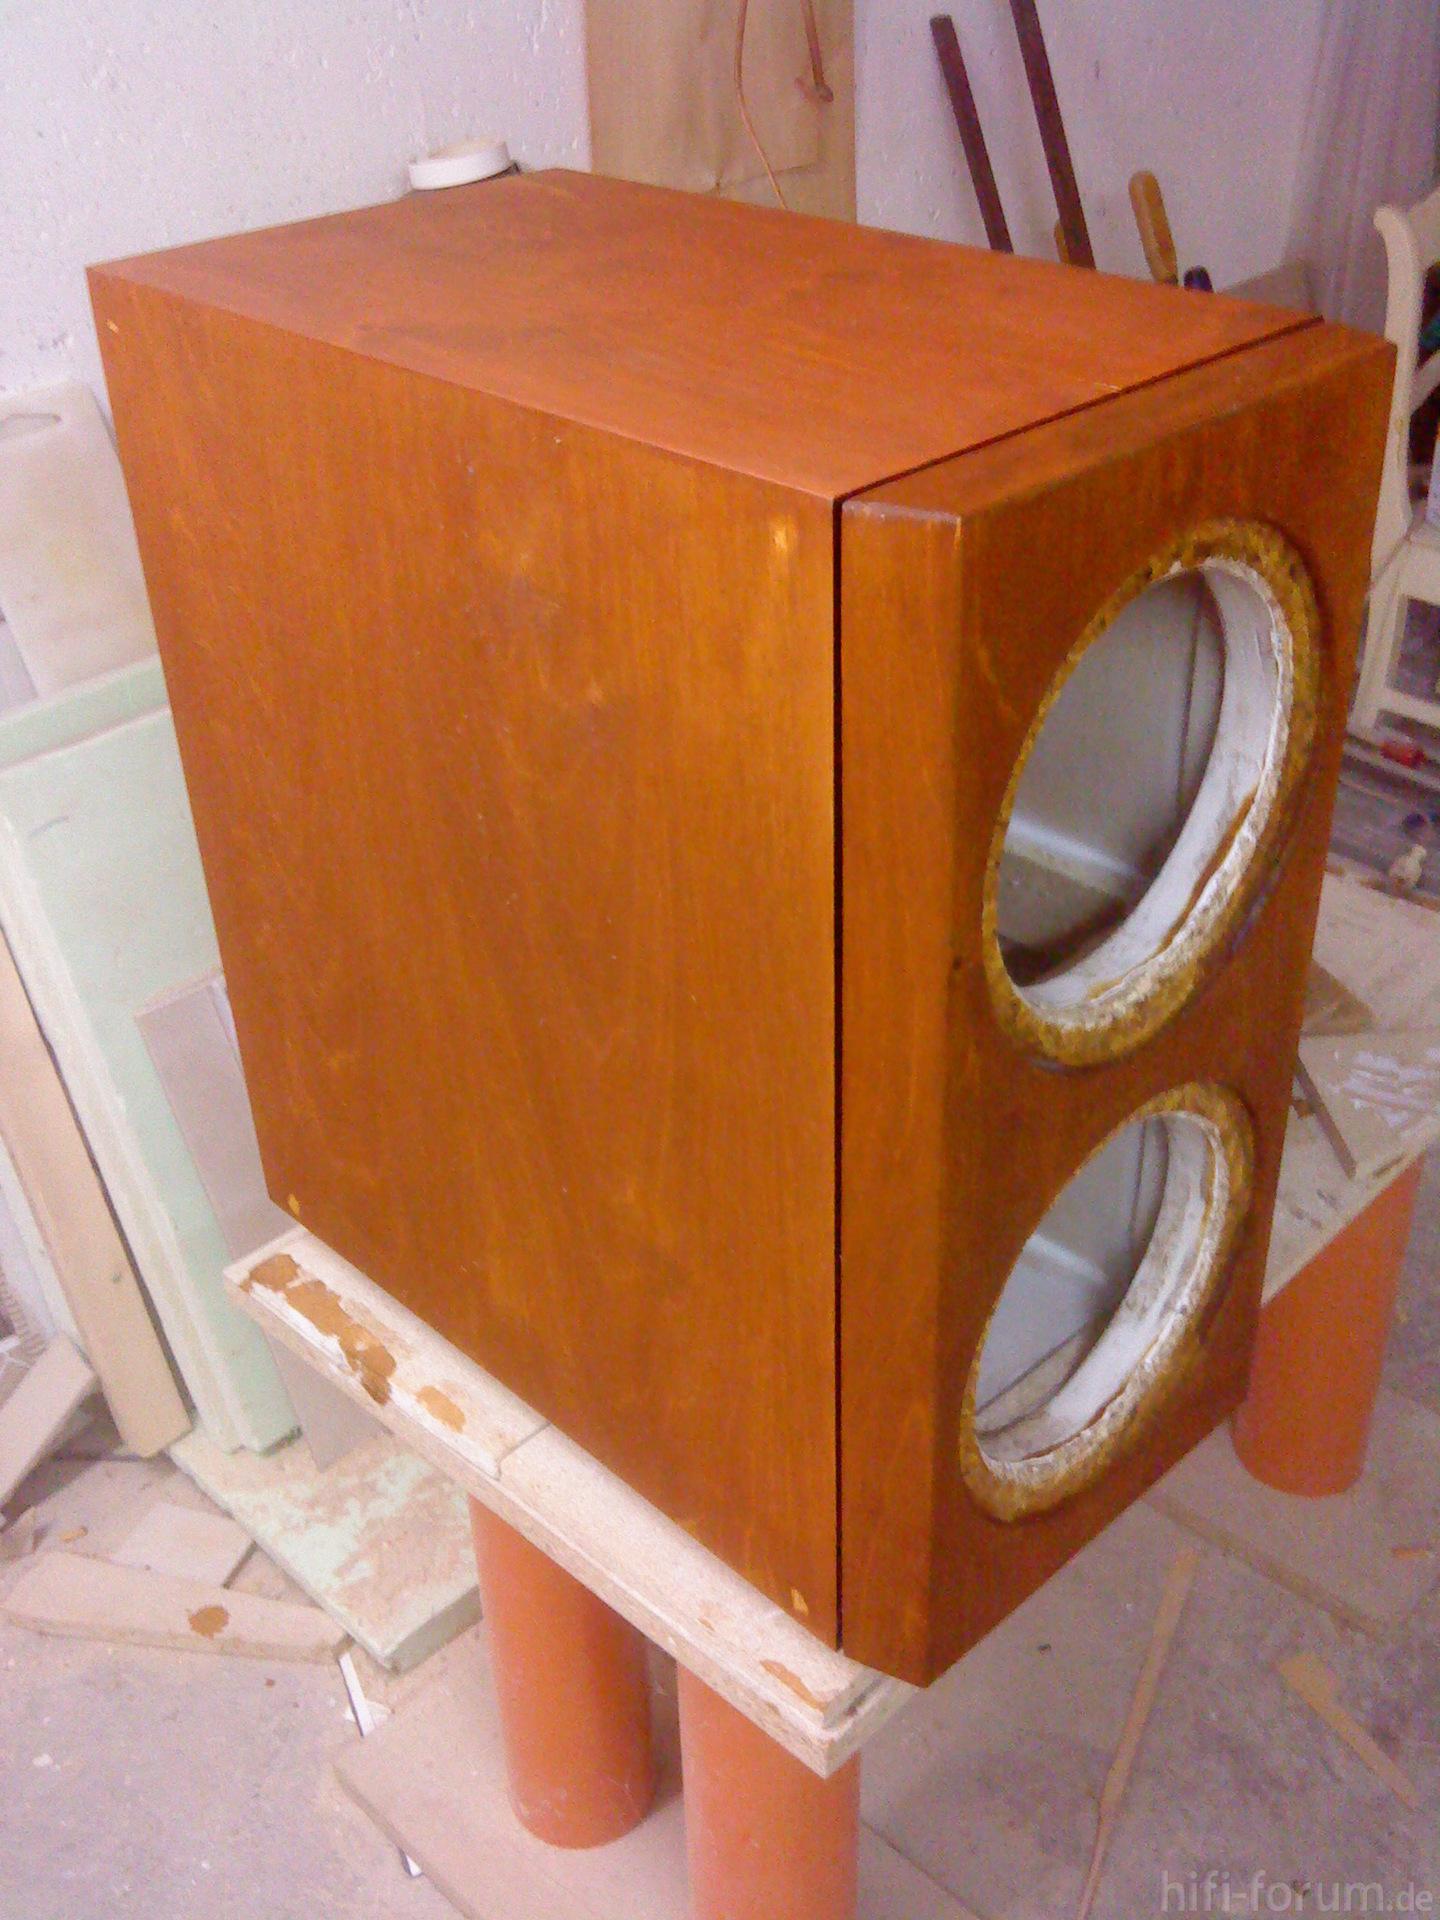 sub f r horn sats 4 1 005 horn sats sub hifi forum. Black Bedroom Furniture Sets. Home Design Ideas